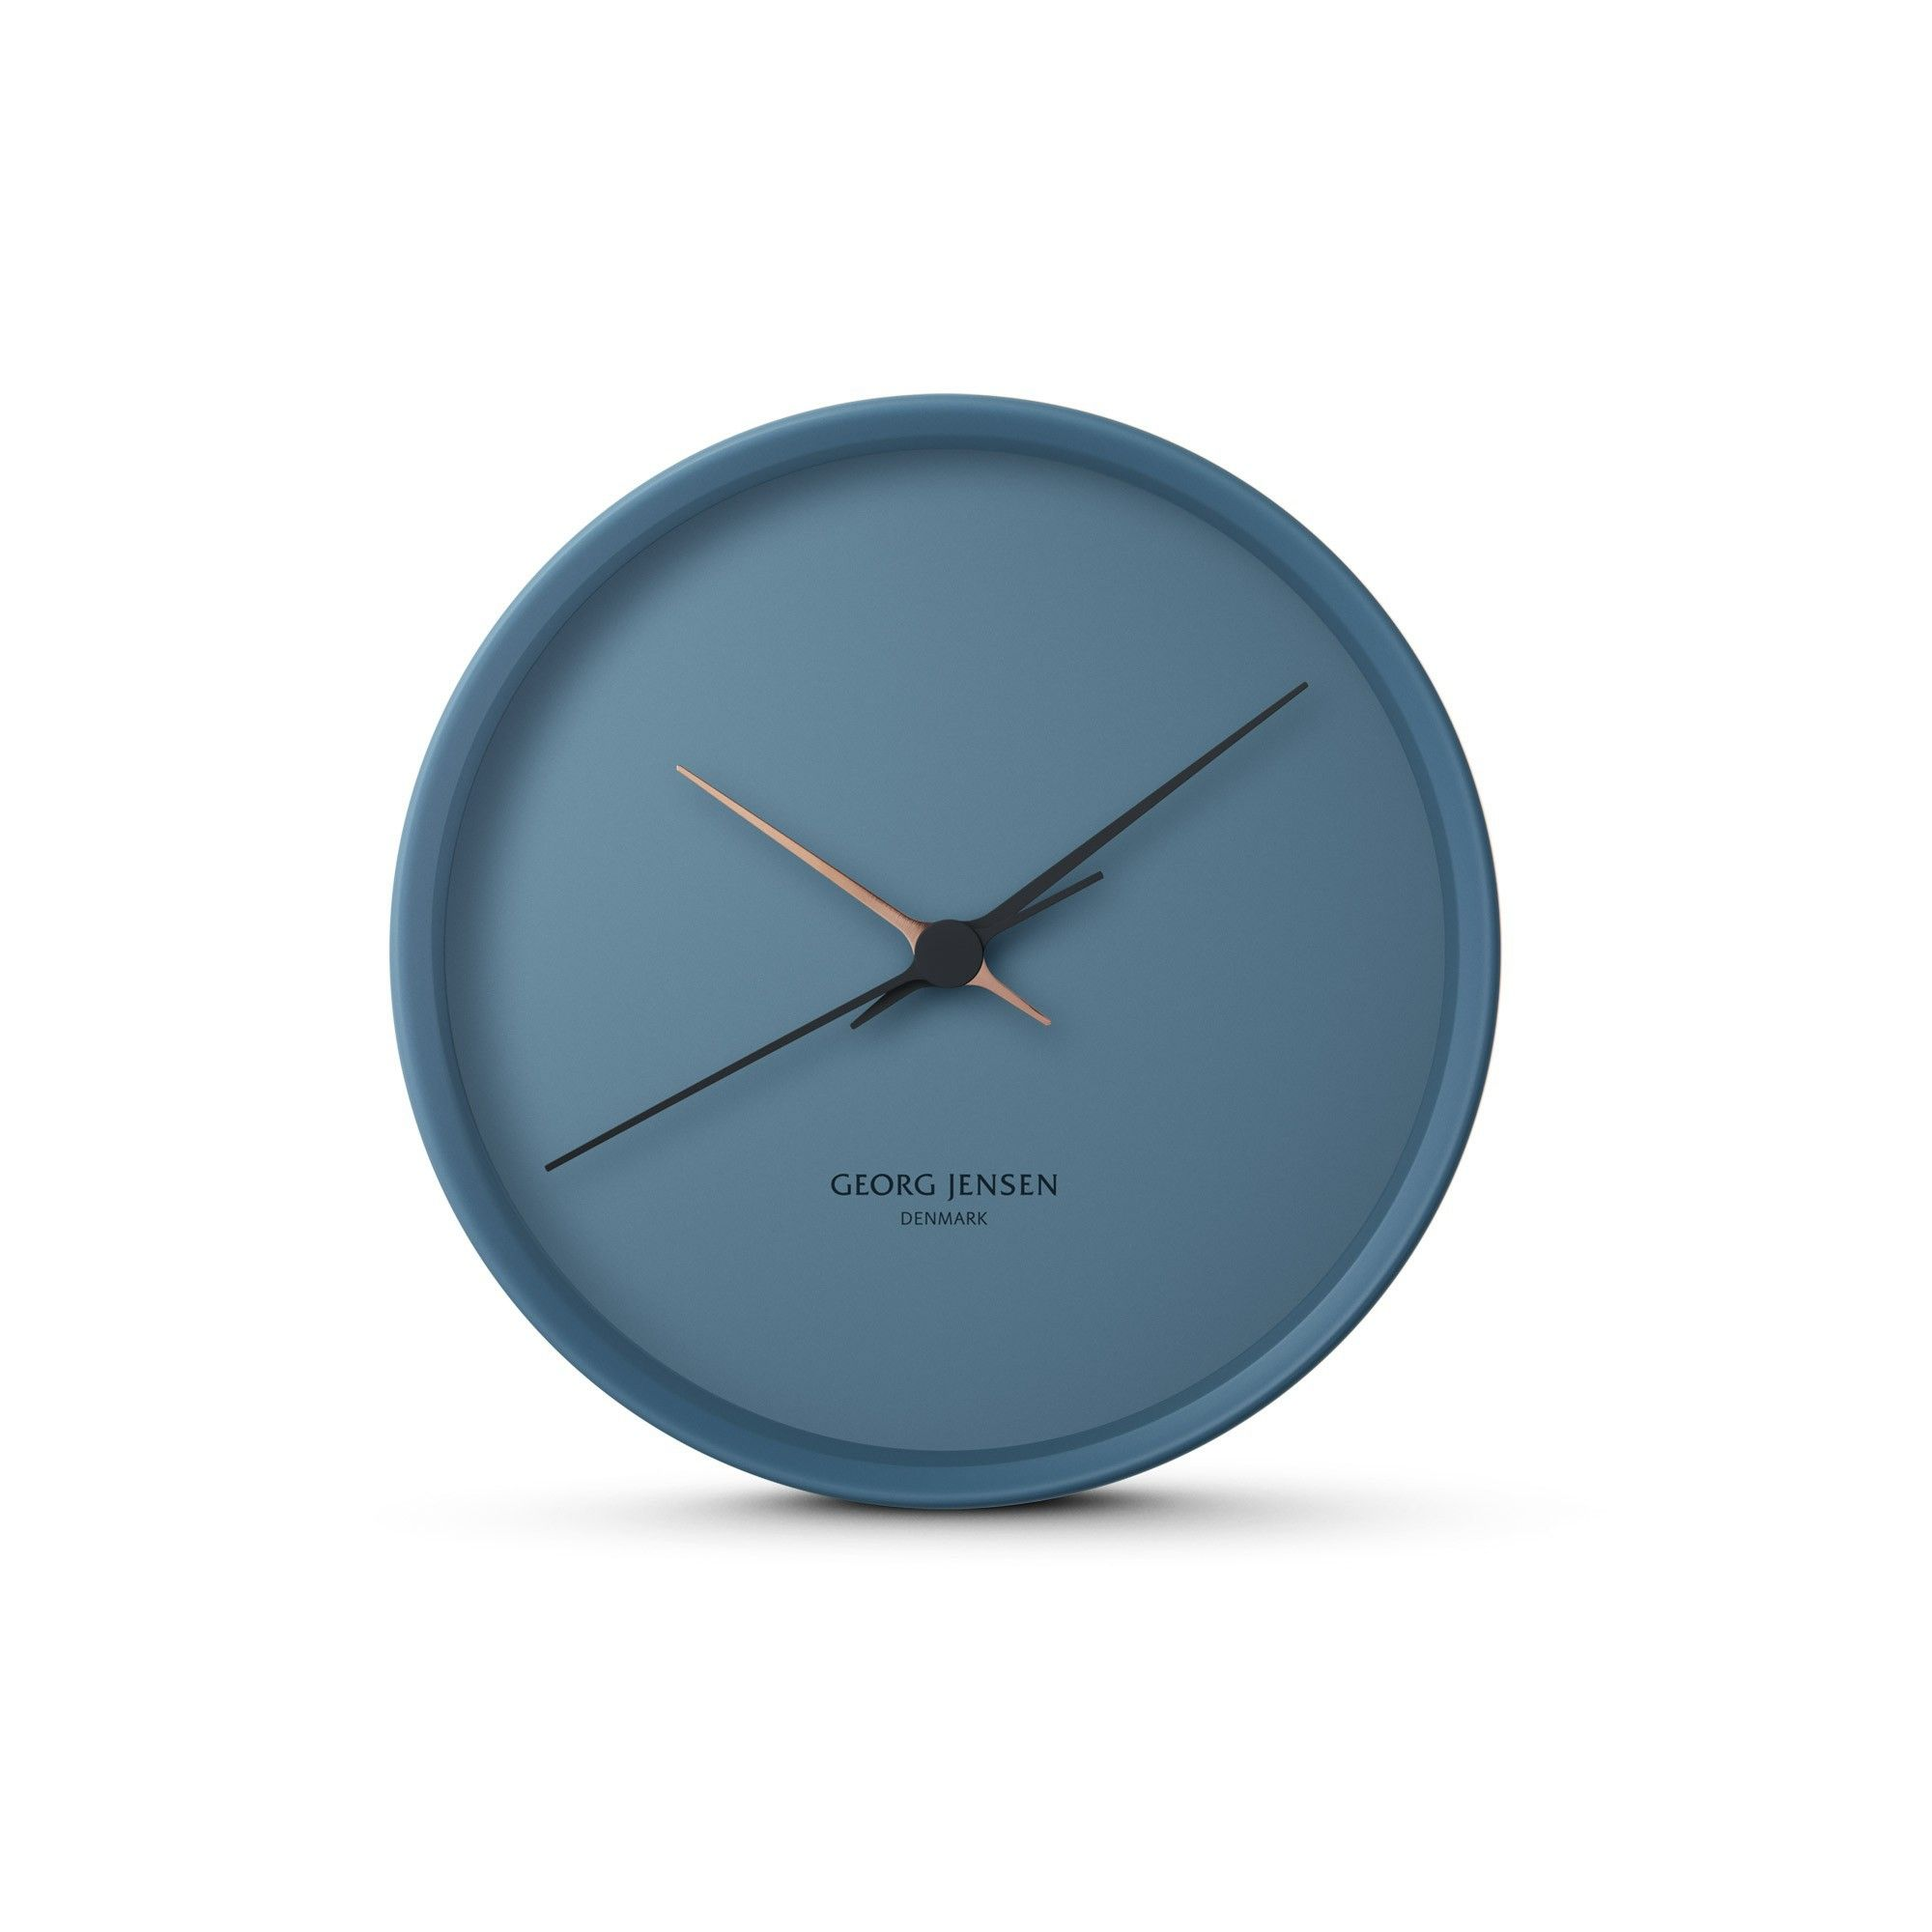 Home Goods Clocks: Koppel Wall Clock, Blue